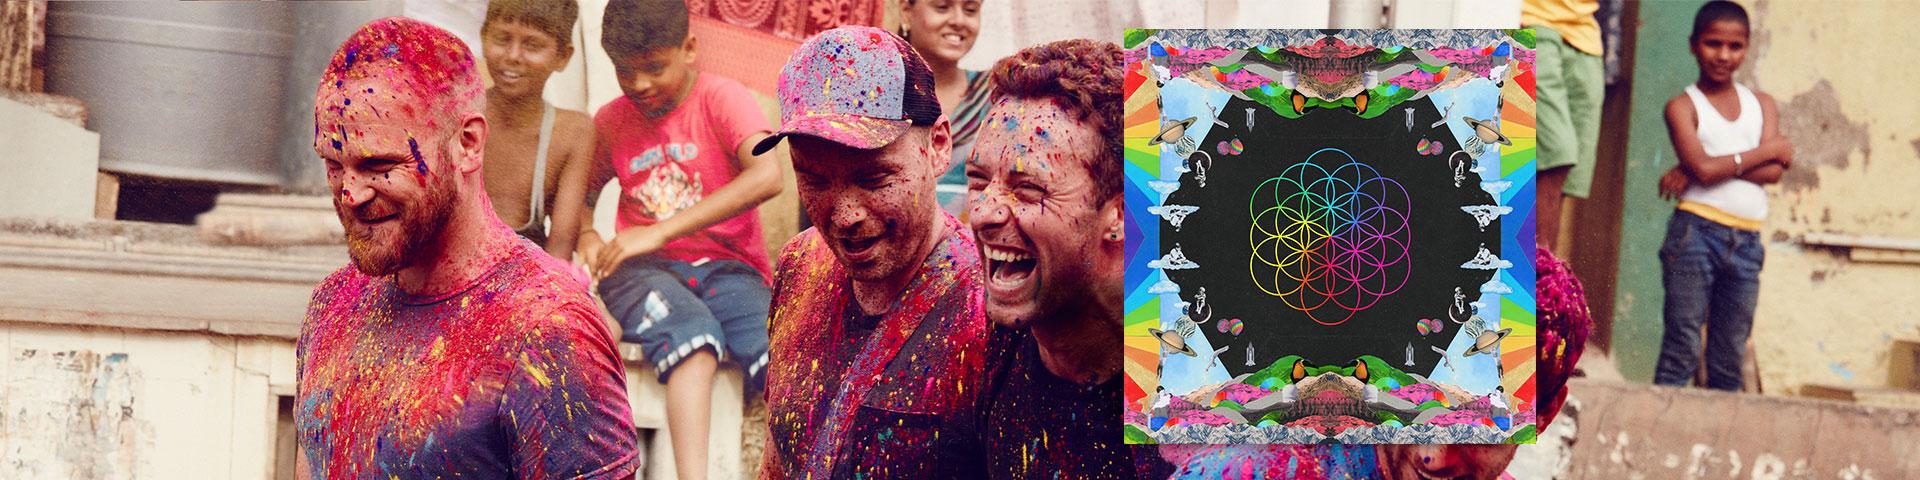 Coldplay - A Head Full of Dreams forudbestilling